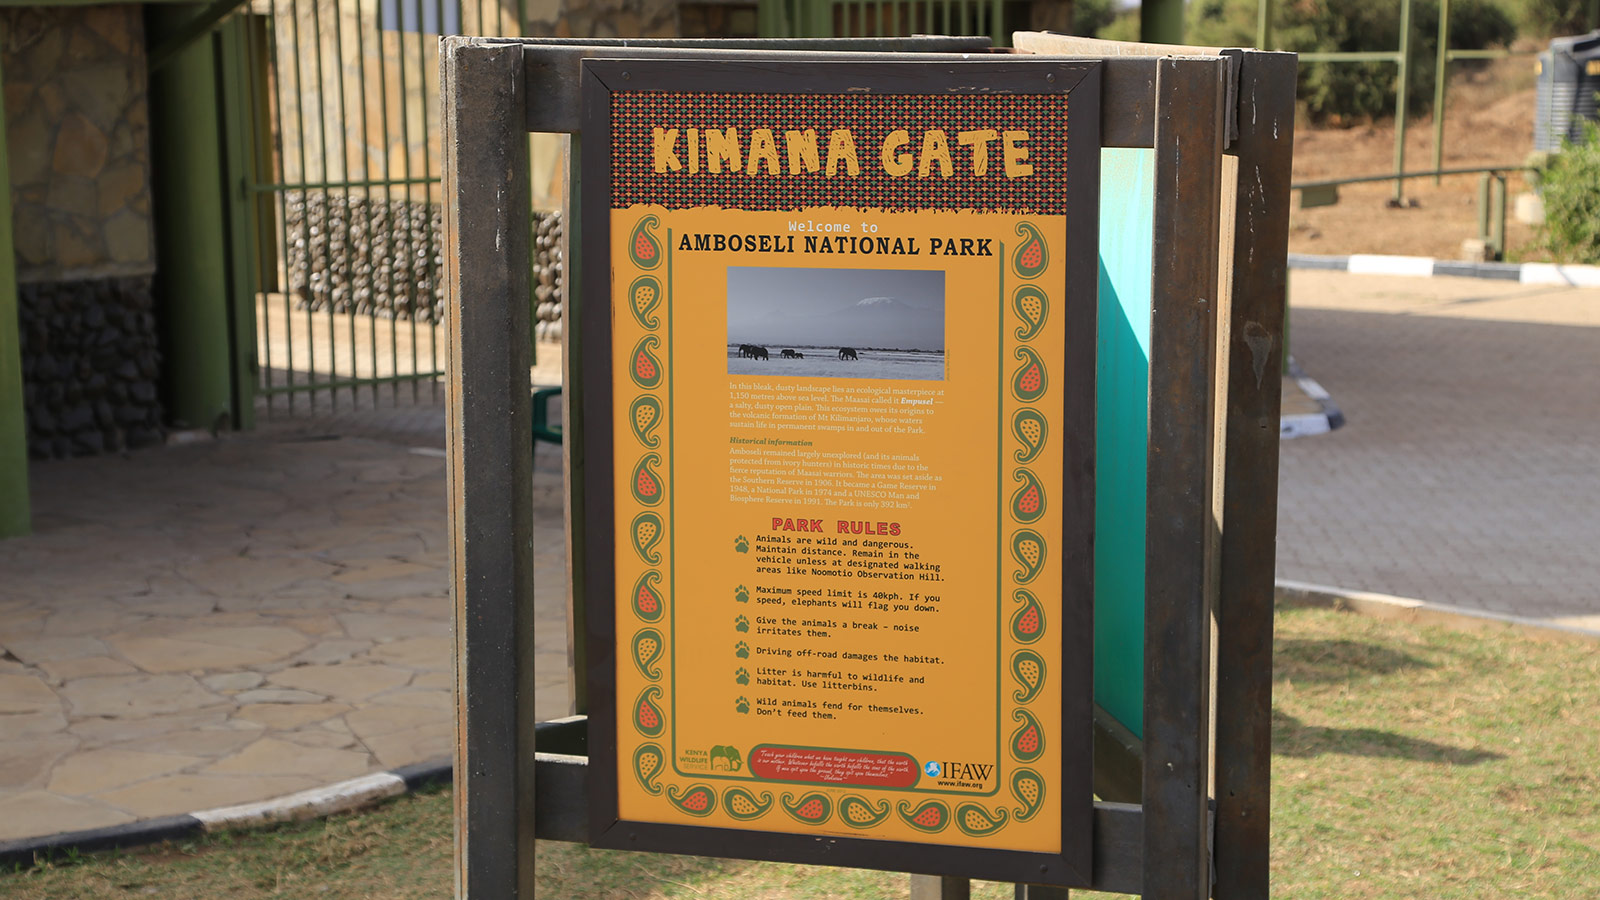 Eingang zum Amboseli Nationalpark, Kenia